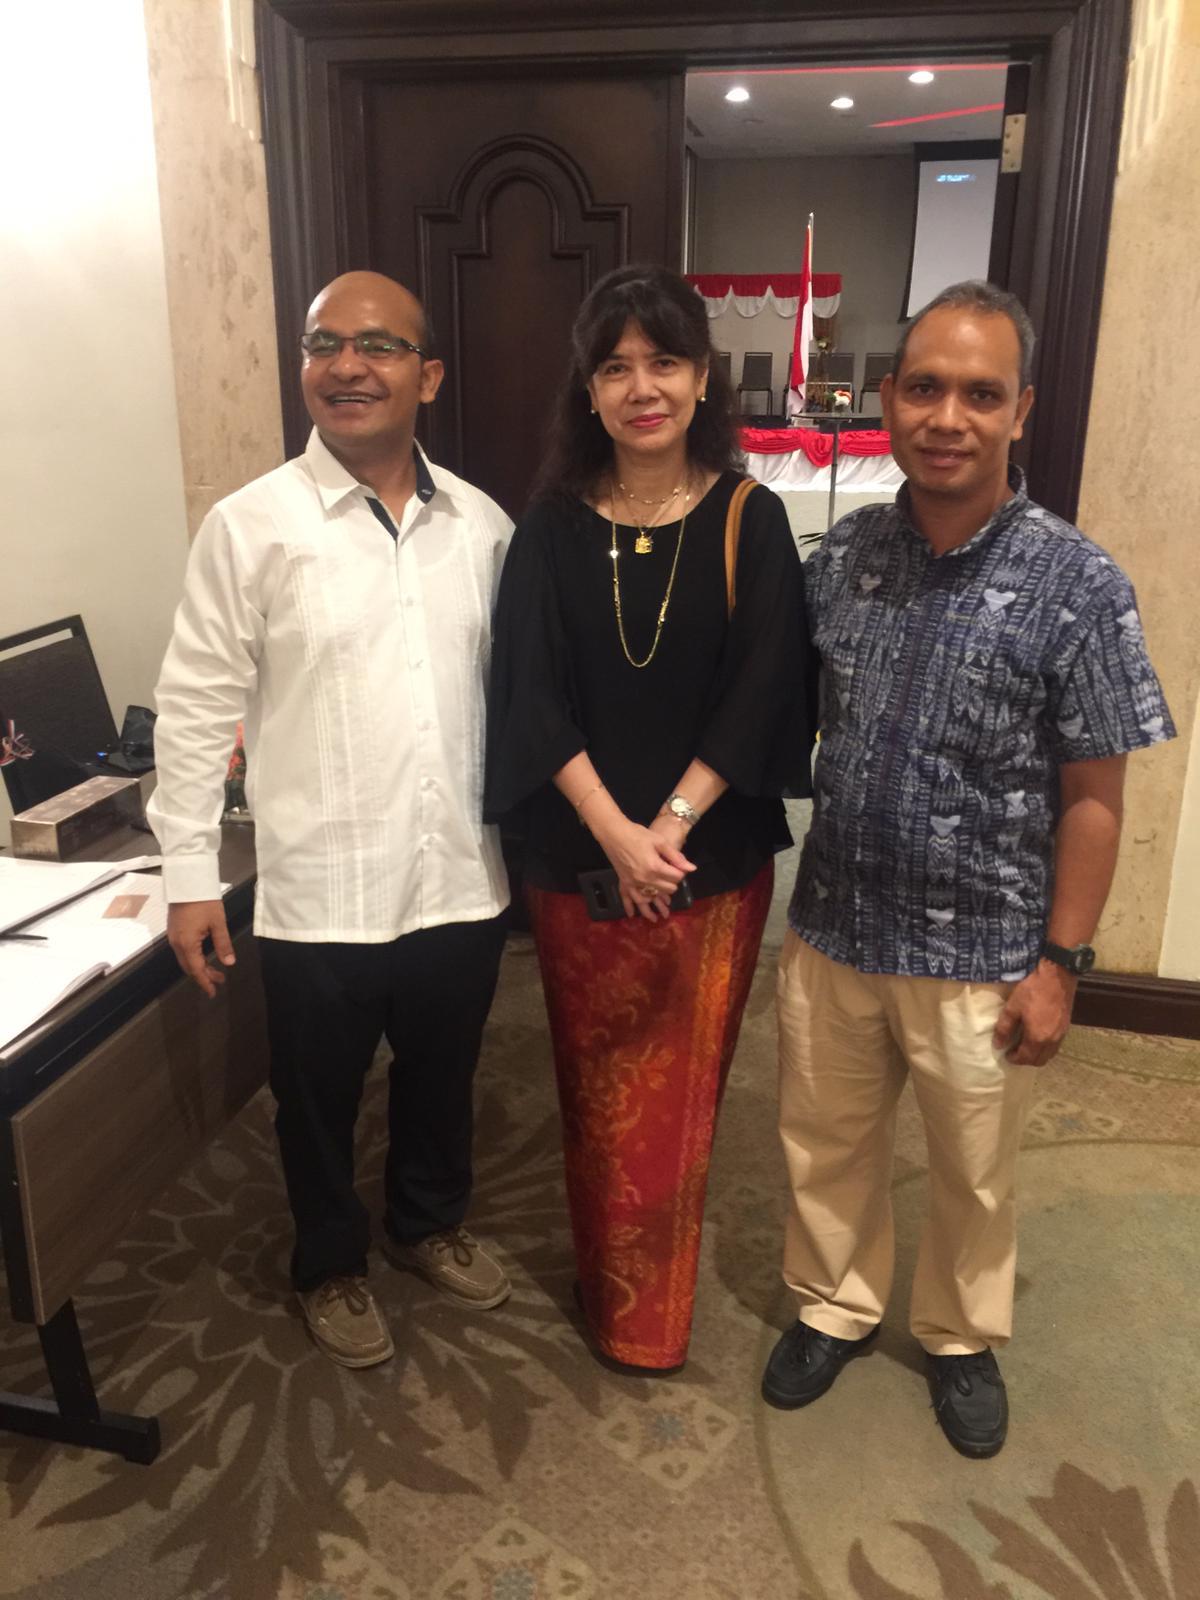 Duta Besar Emeria Siregar bersama dengan dua Romo asal Indonesia